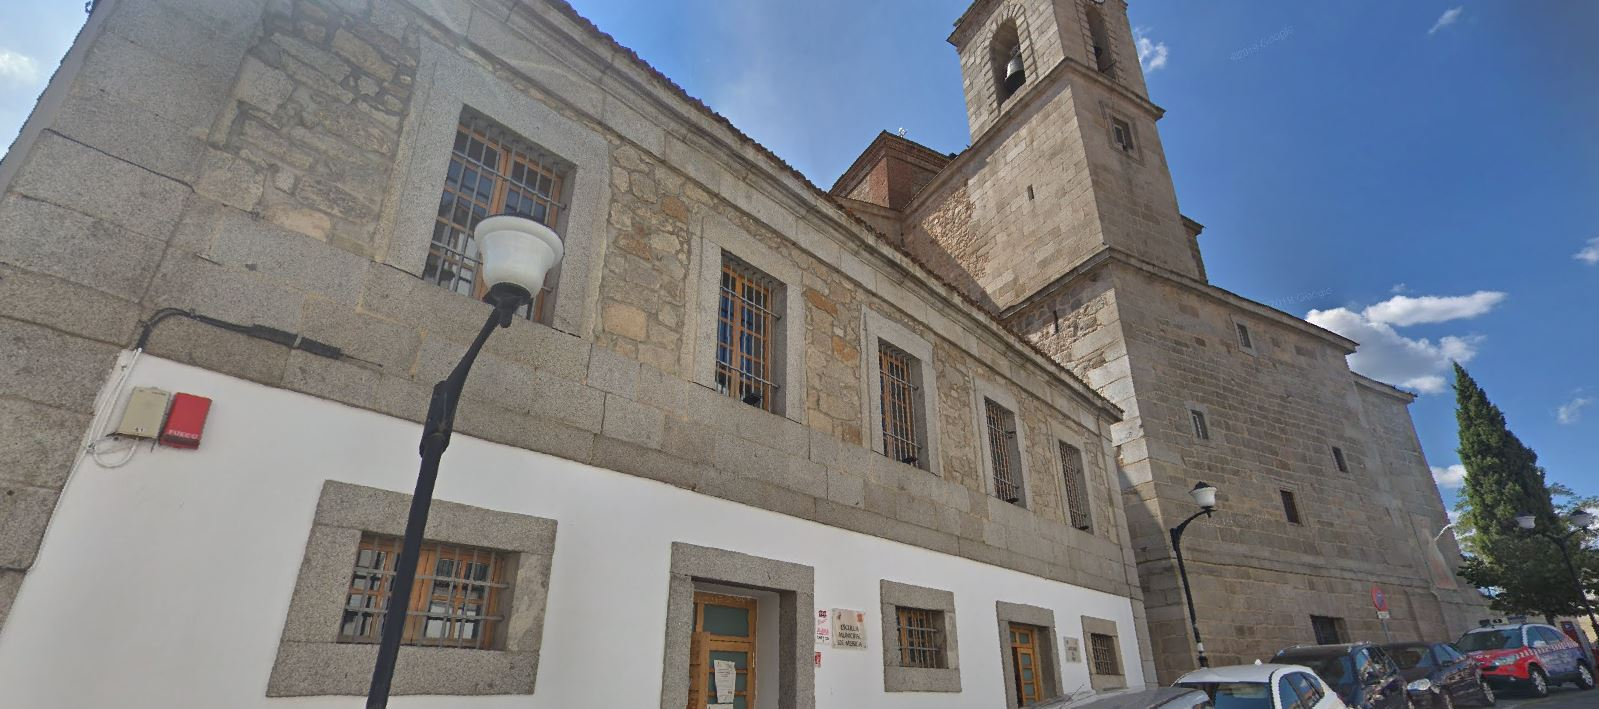 Registro civil - Juzgado de Paz San Martín de Valdeiglesias